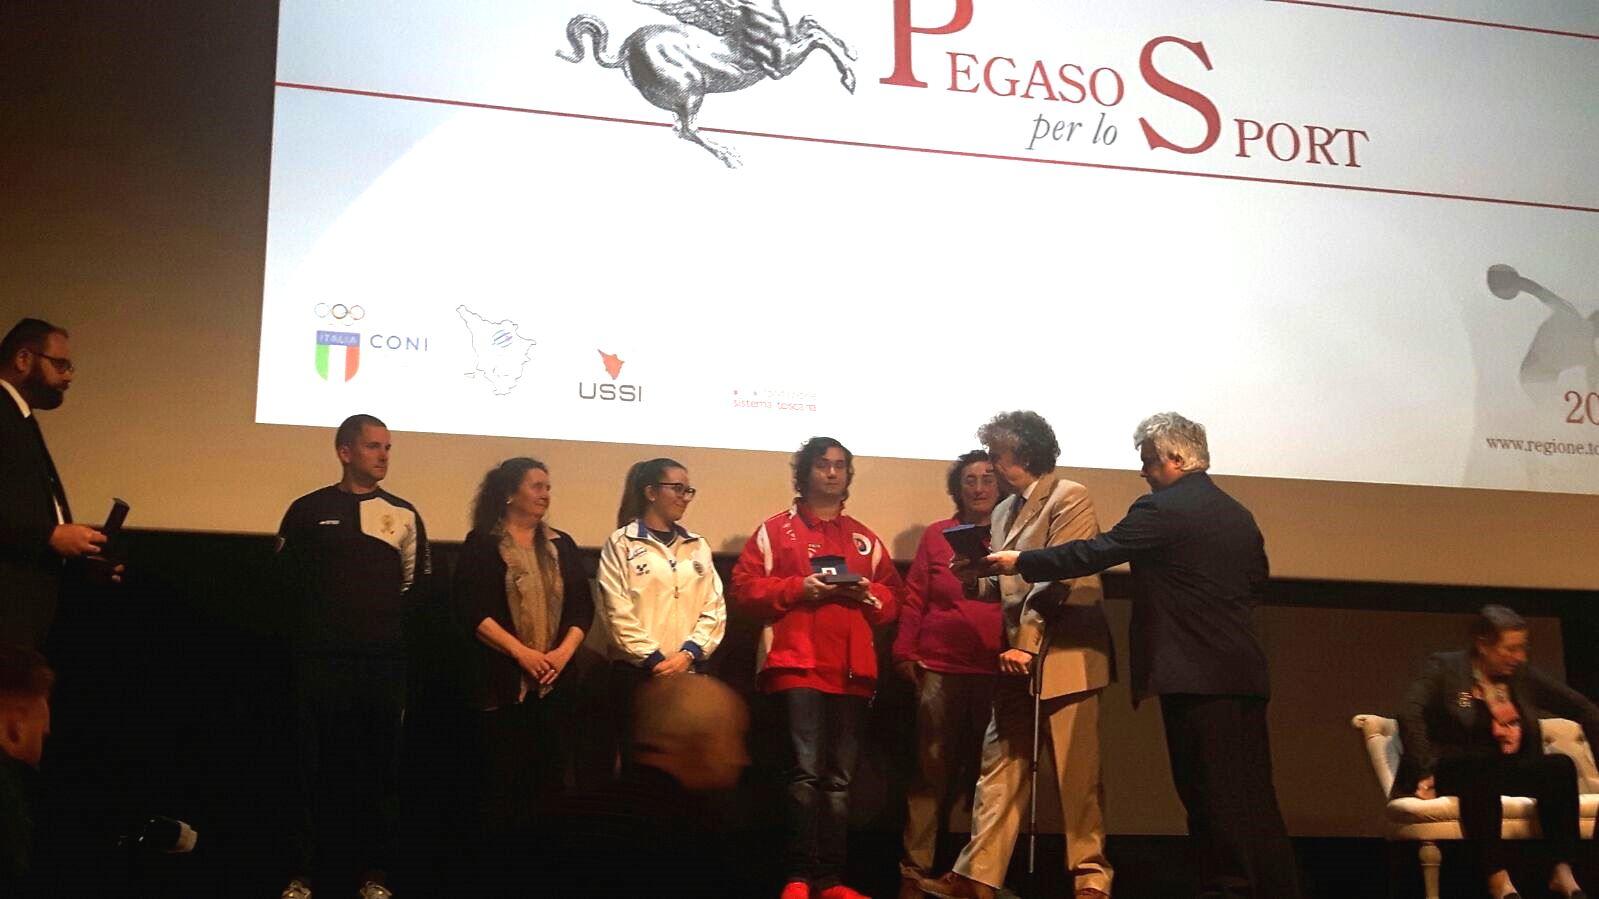 Fitarco_Pegaso_Sport2018